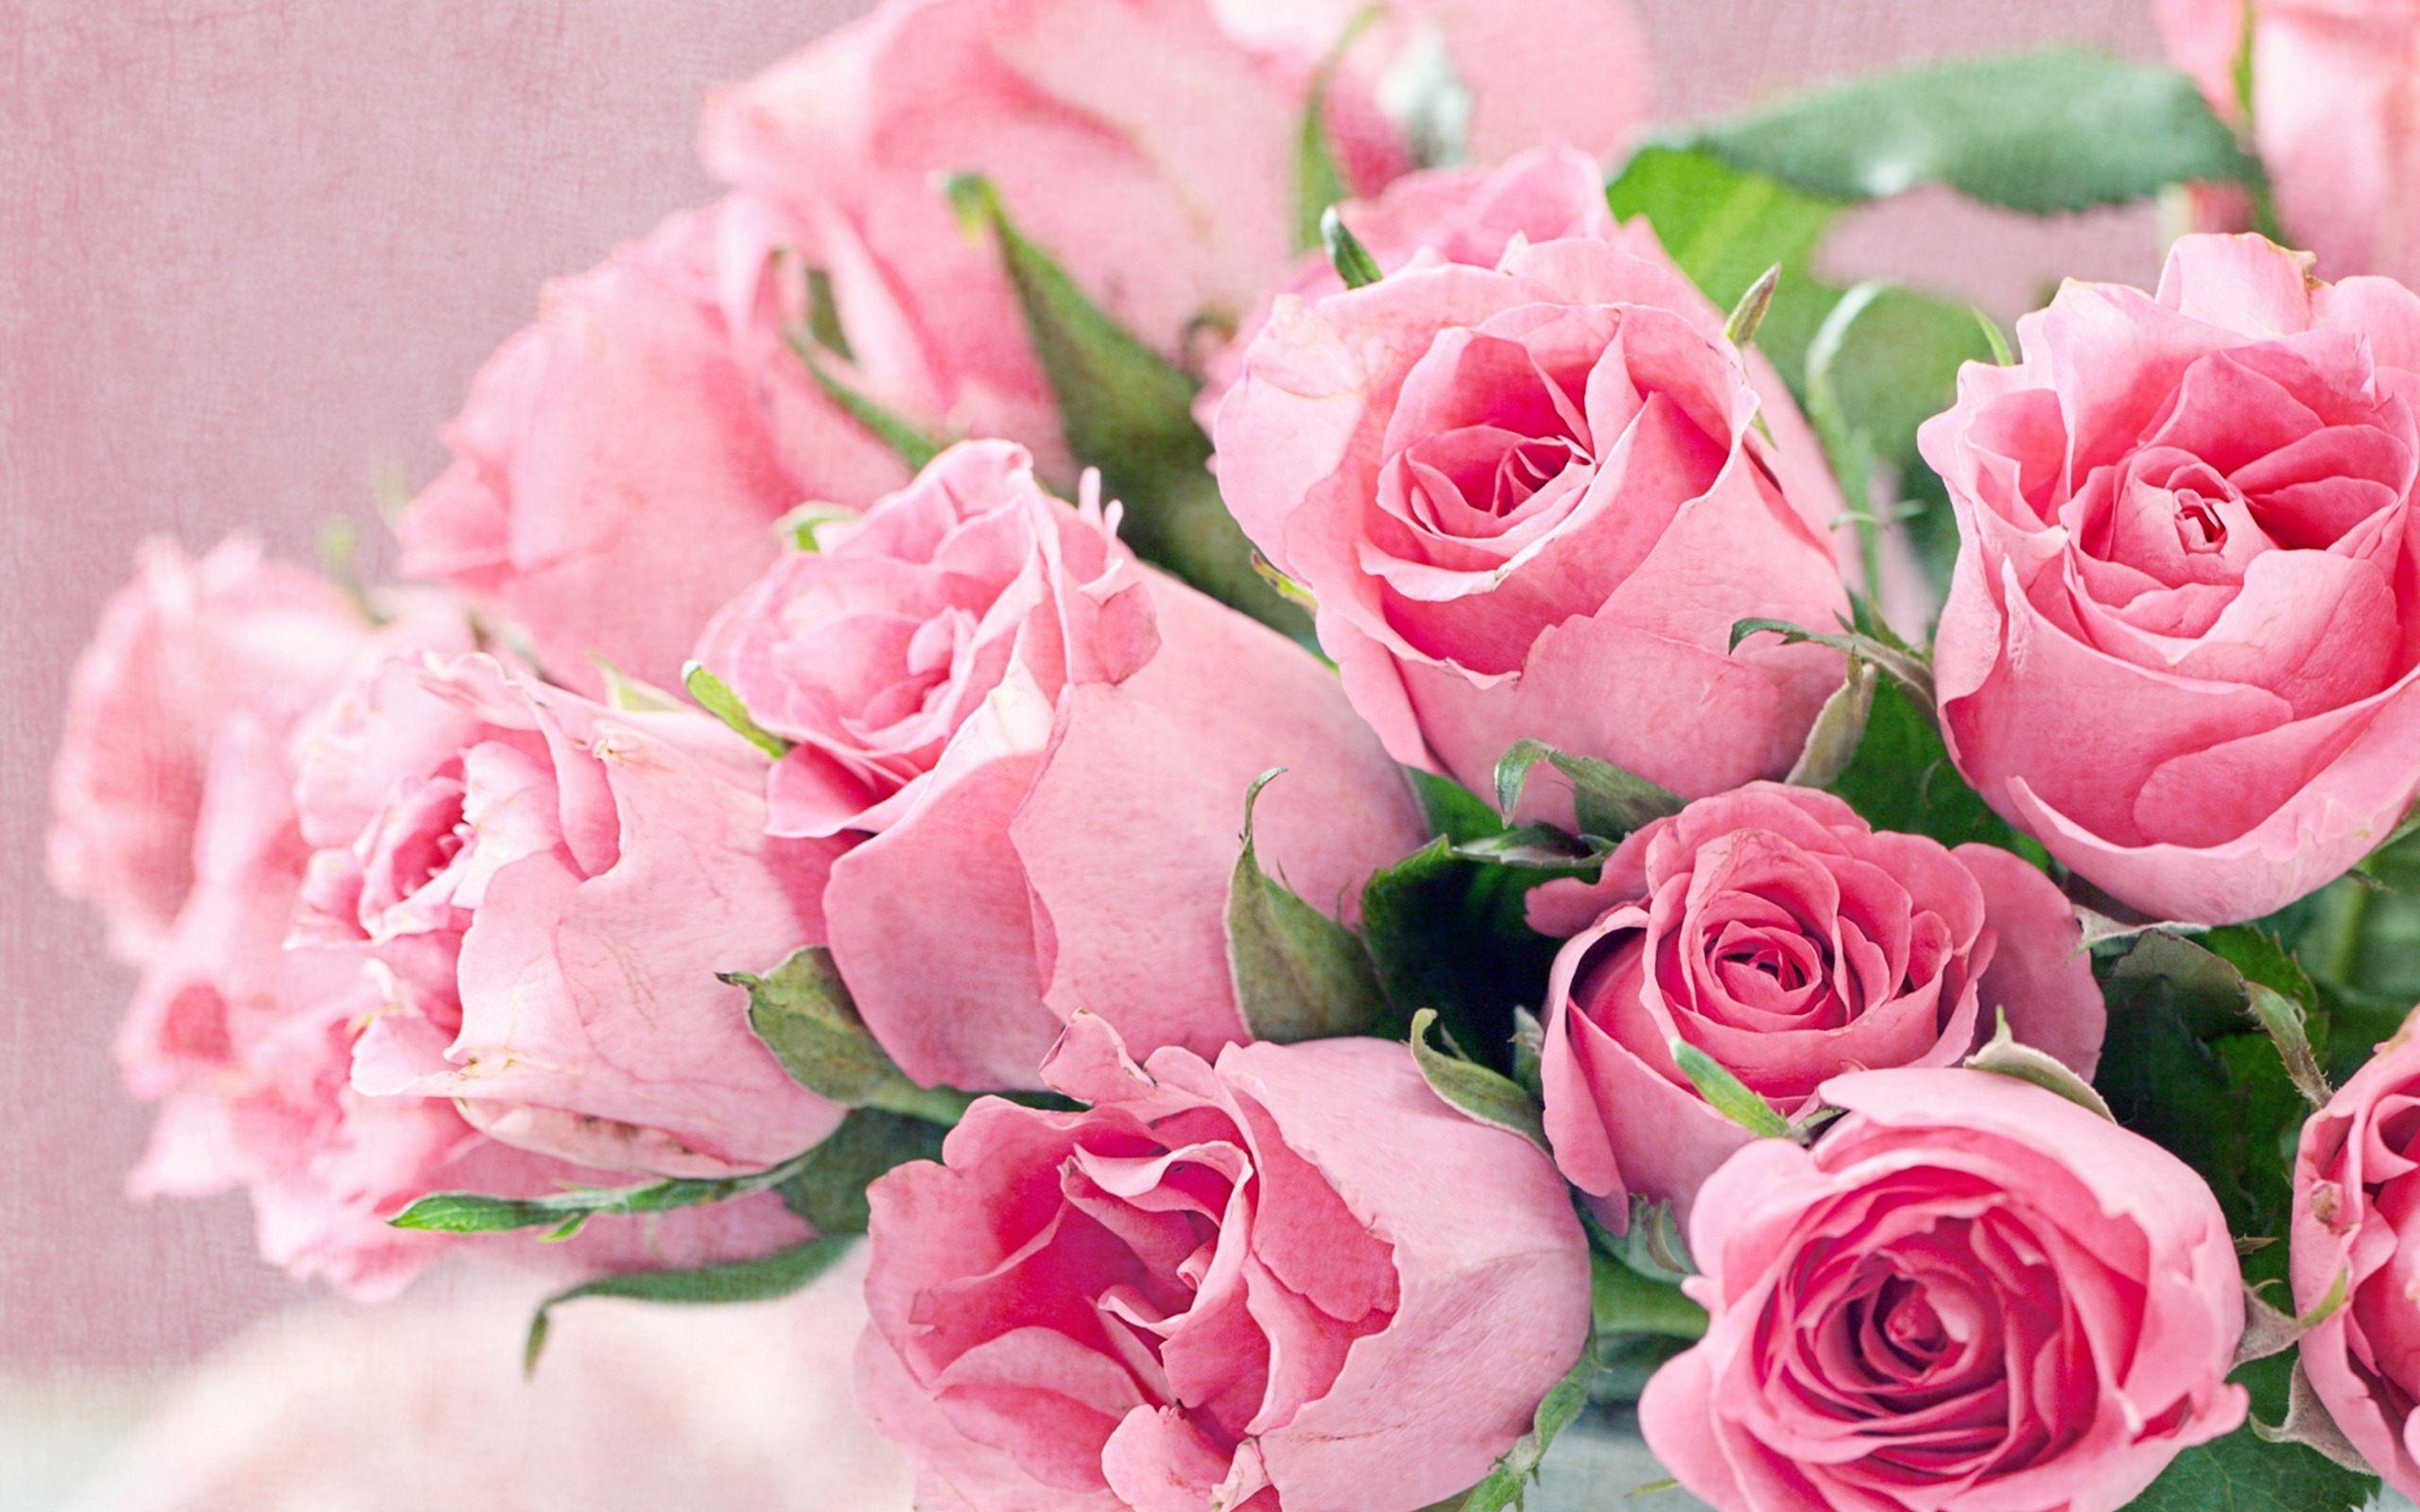 Fresh Roses Pink Flowers Wllpaper HD Download For Desktop